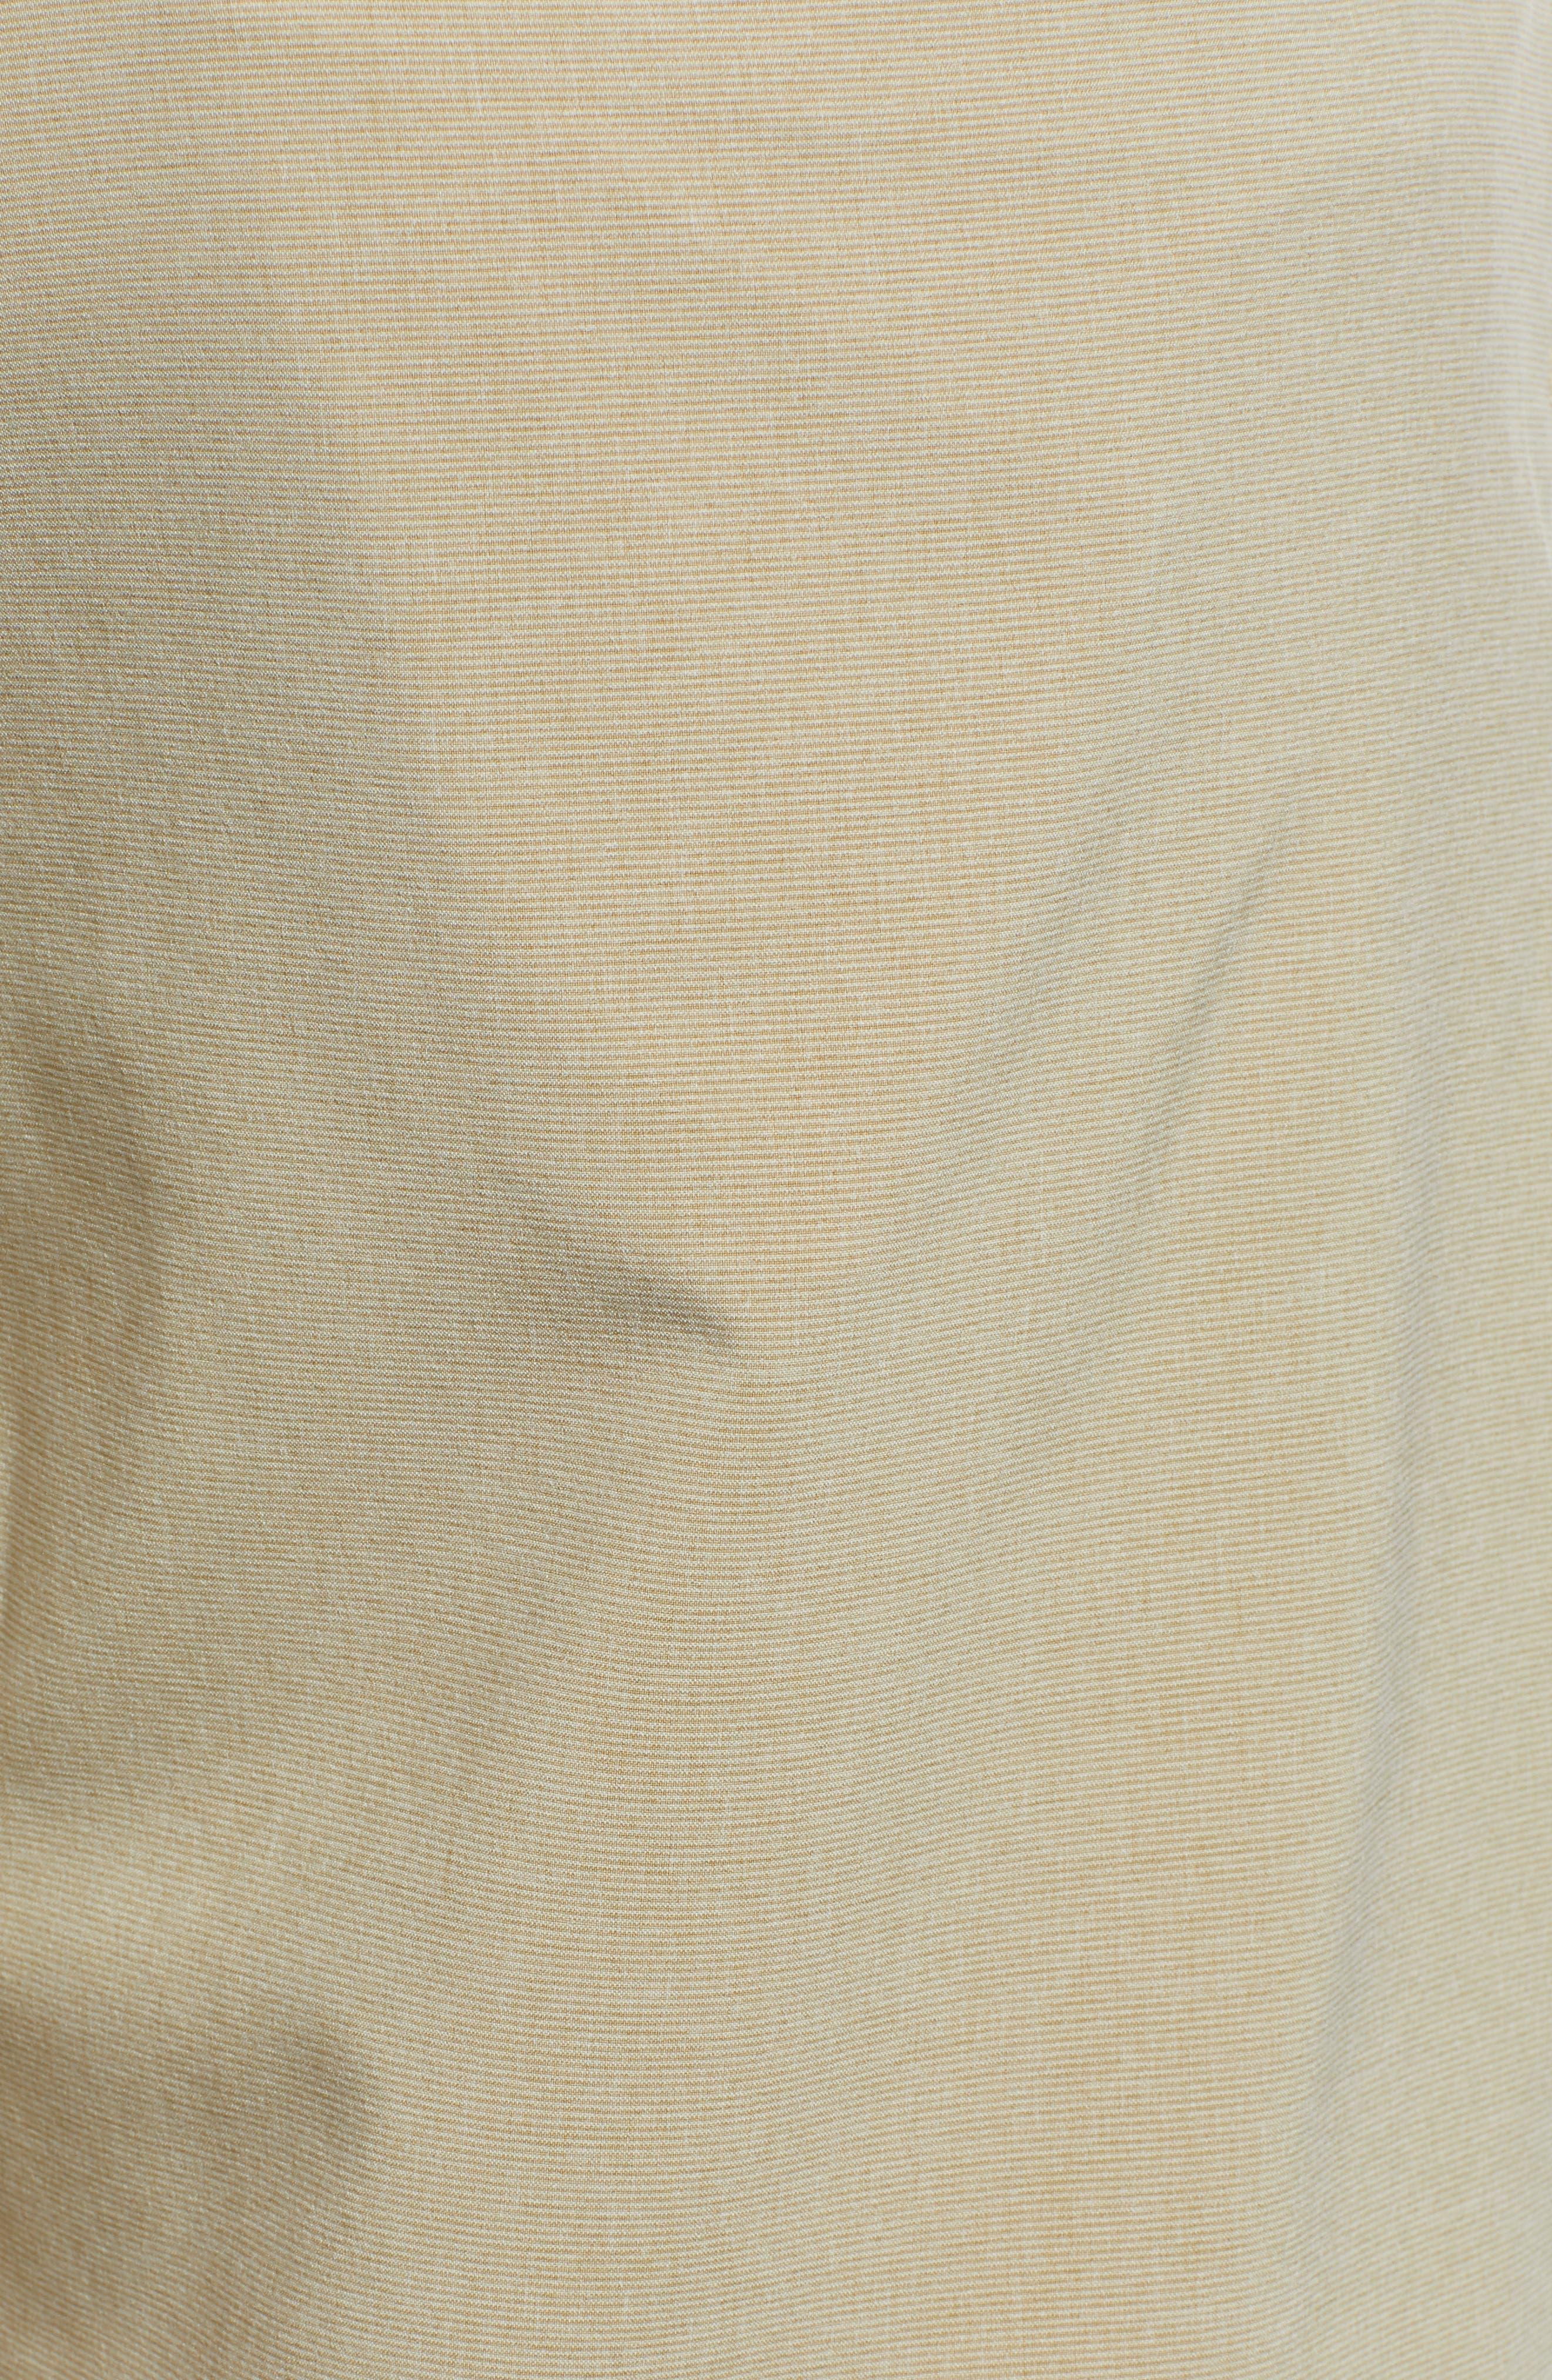 QUIKSILVER WATERMAN COLLECTION,                             Suva Amphibian Hybrid Shorts,                             Alternate thumbnail 5, color,                             TWILL